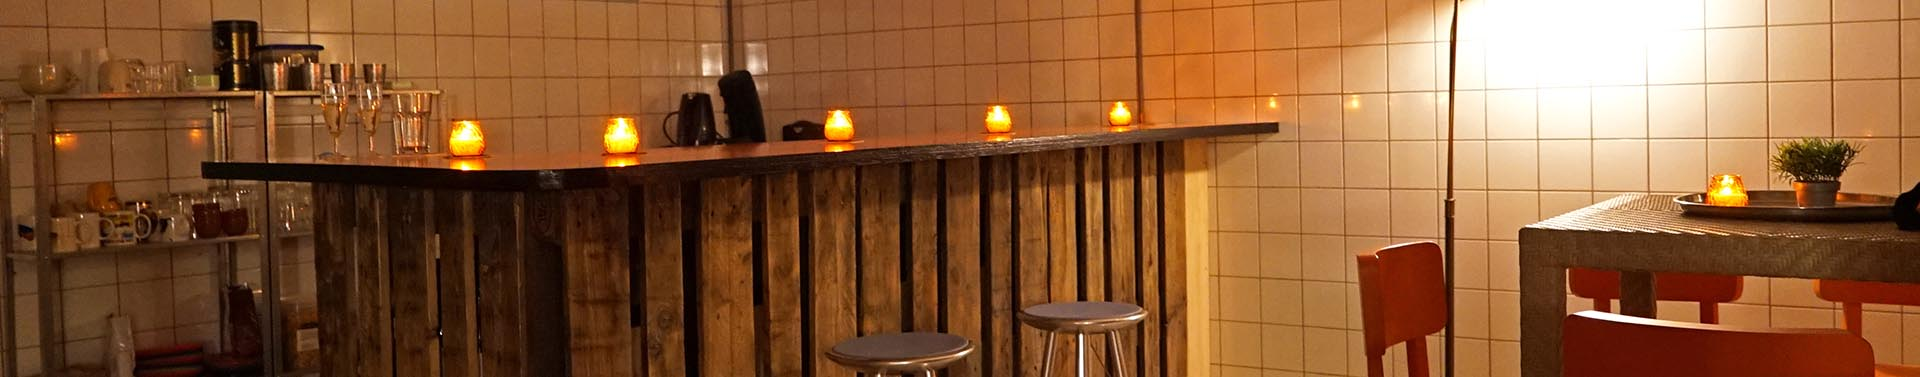 A-Broad Bar Tarieven